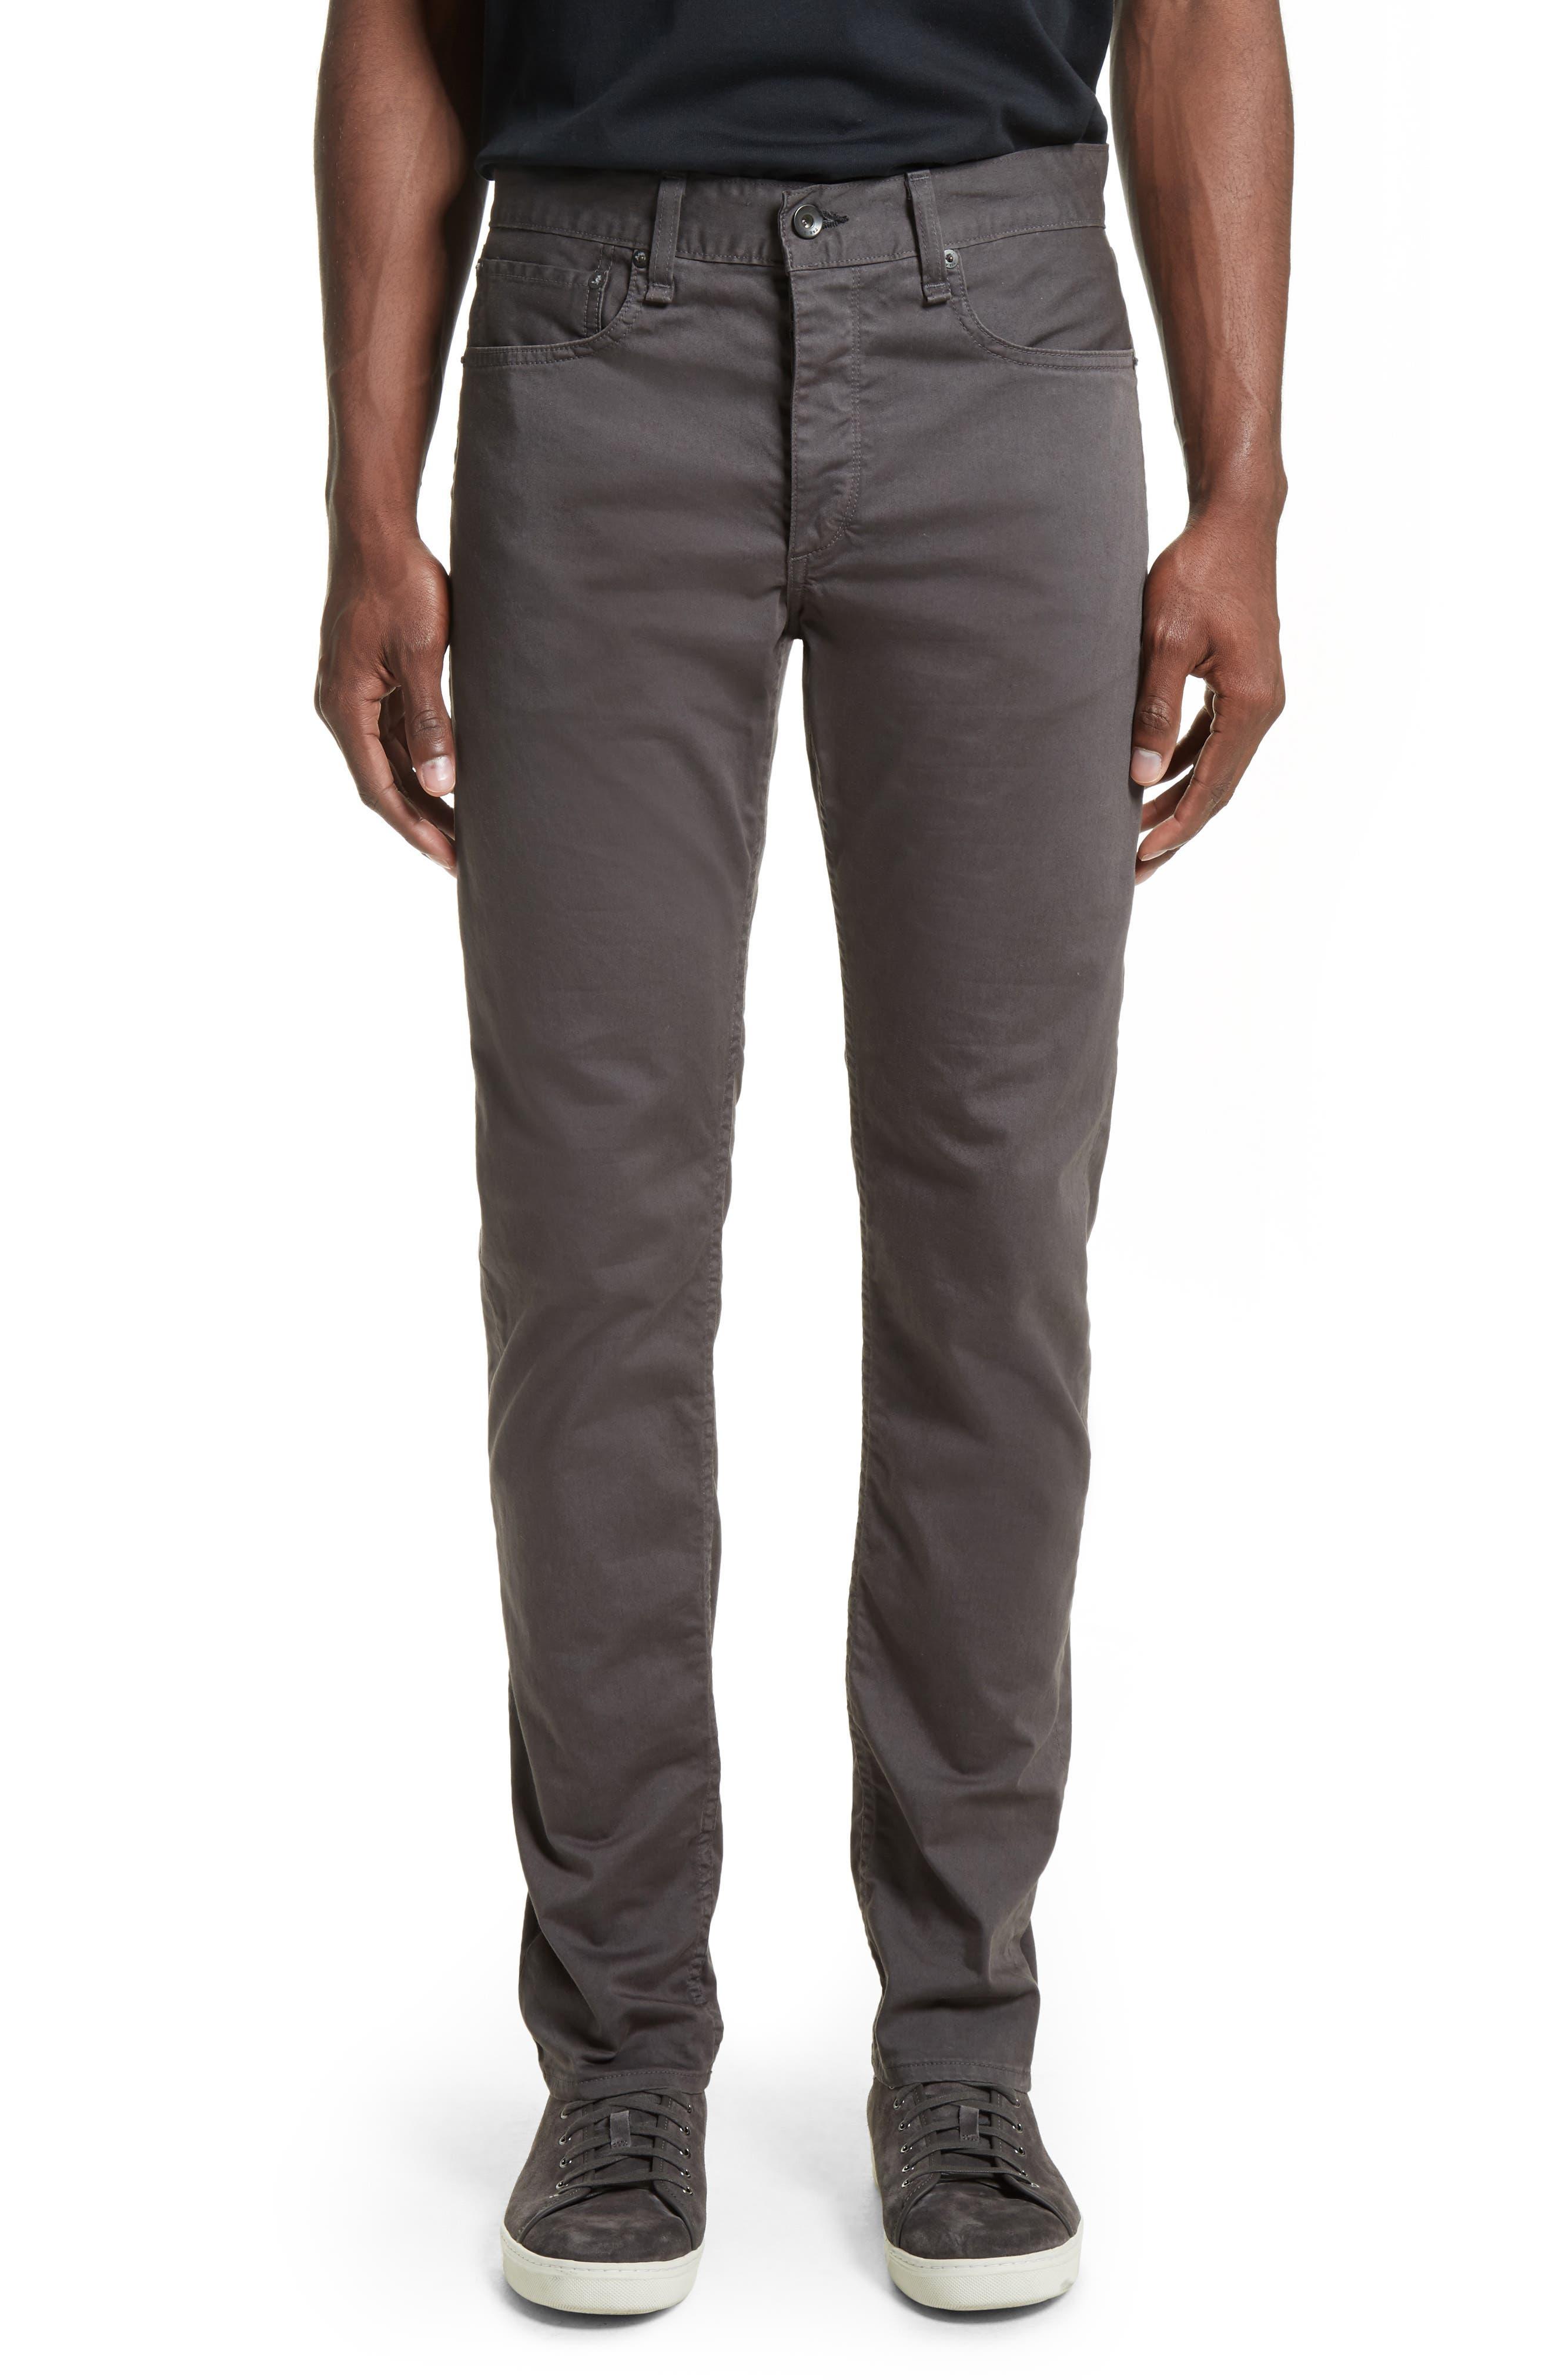 Fit 2 Slim Five-Pocket Pants,                             Main thumbnail 1, color,                             GREY